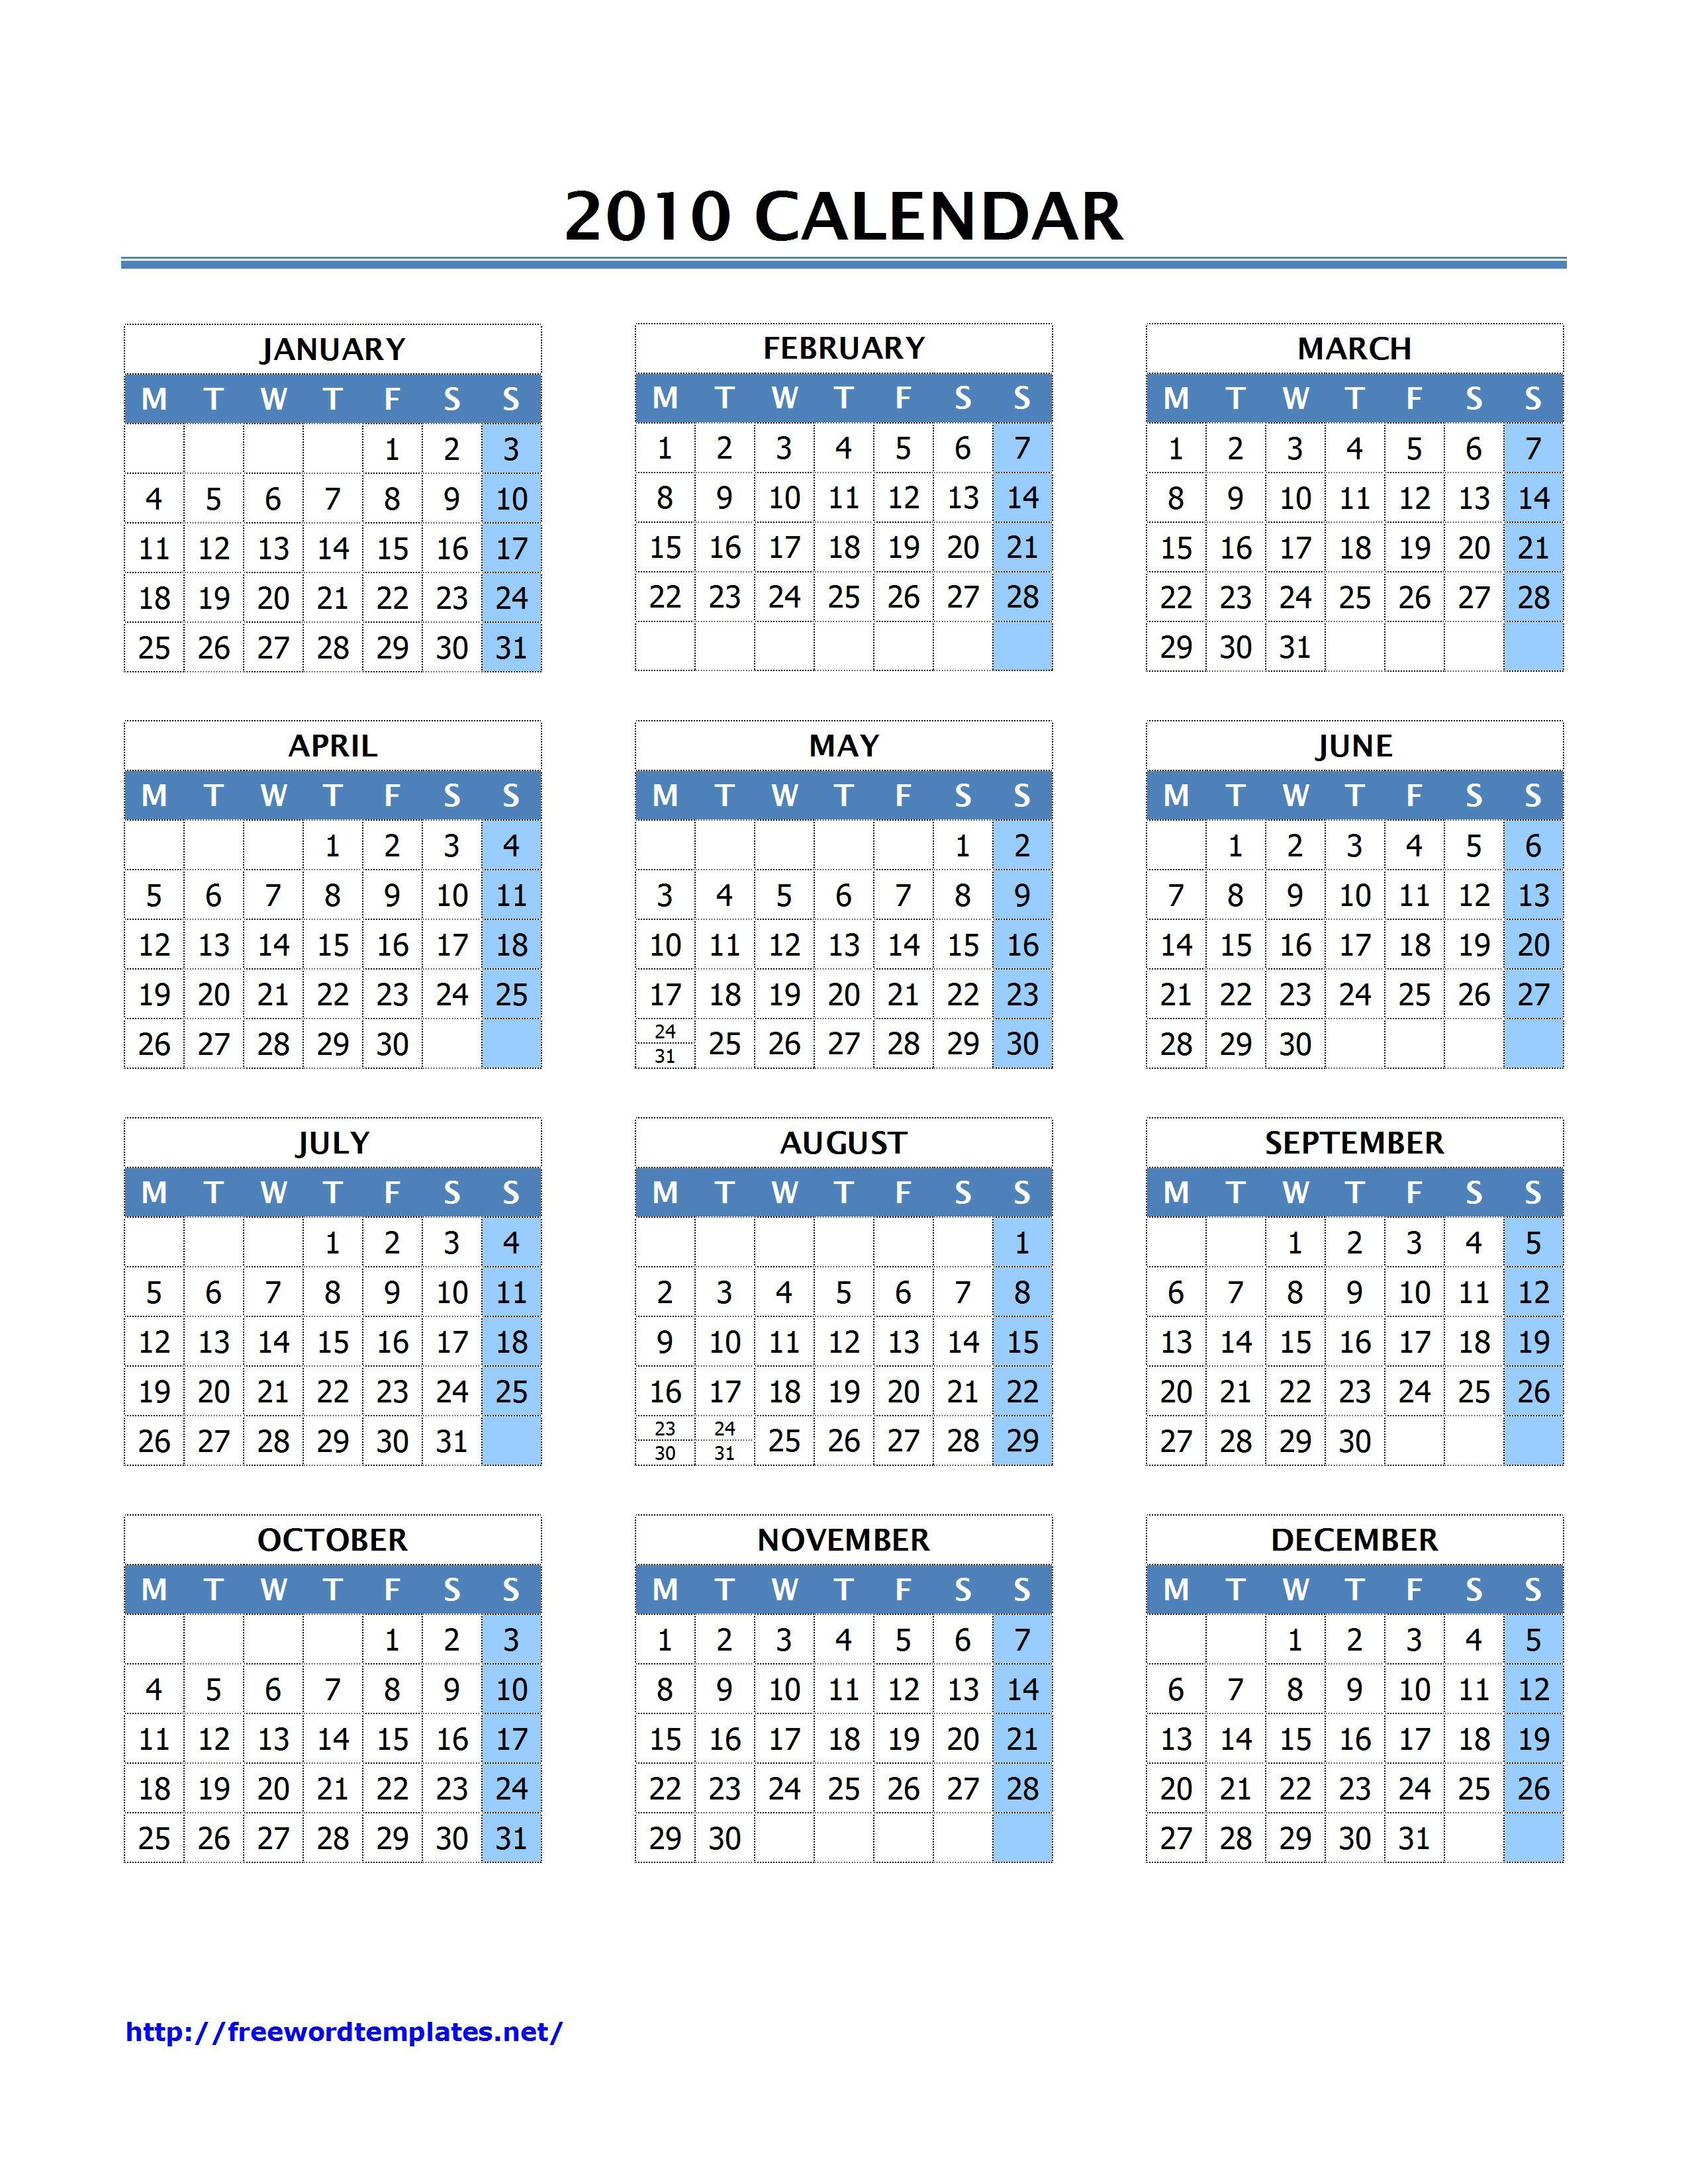 microsoft word 2010 calendar template